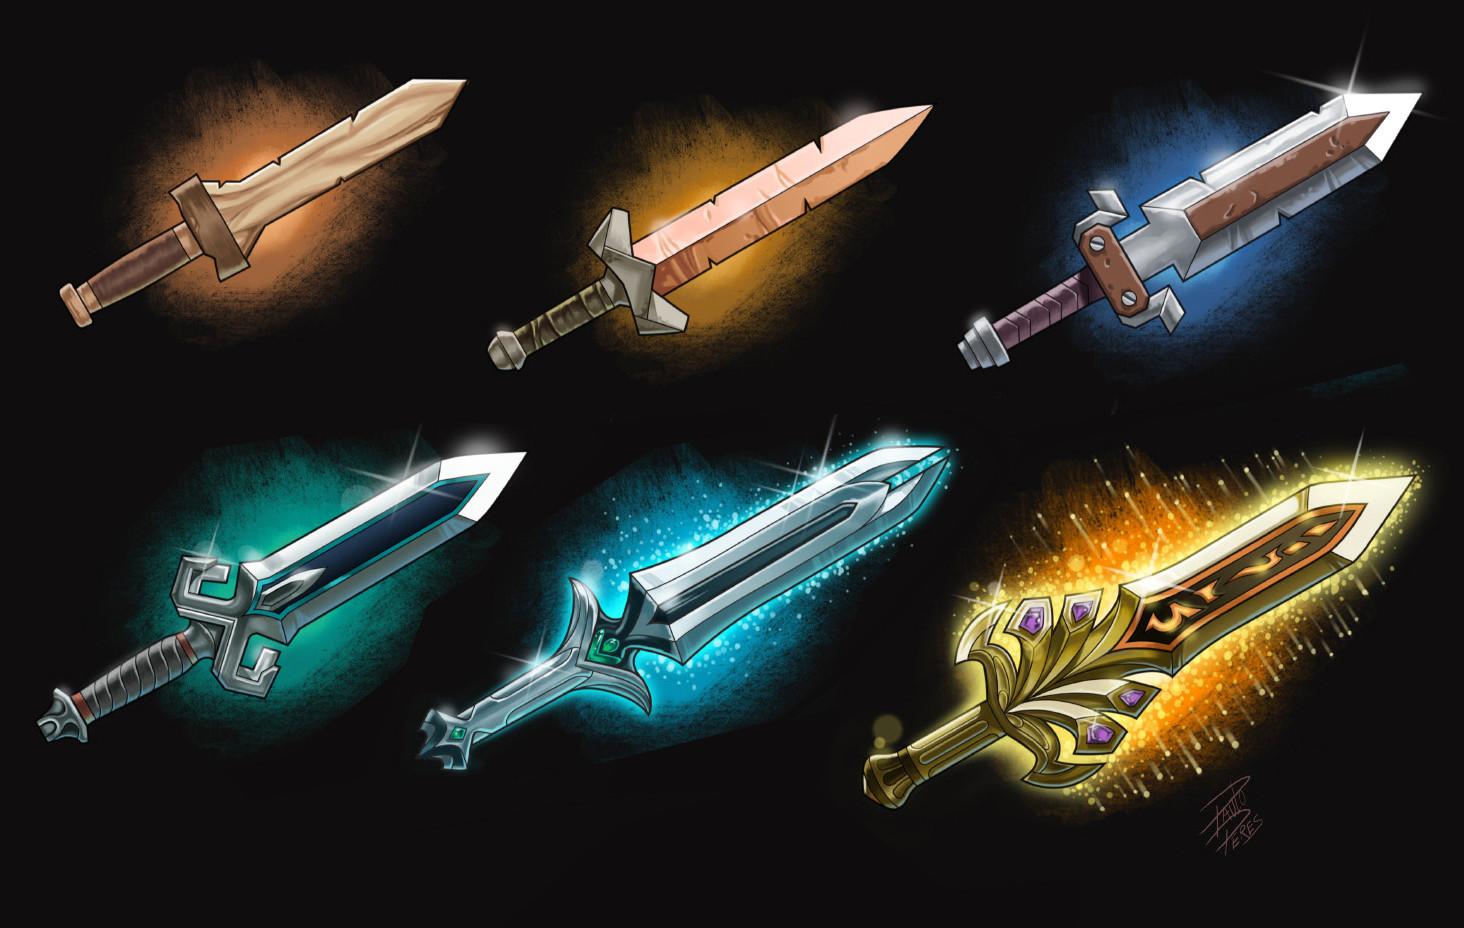 Paulo peres rpg swords paulo peres2